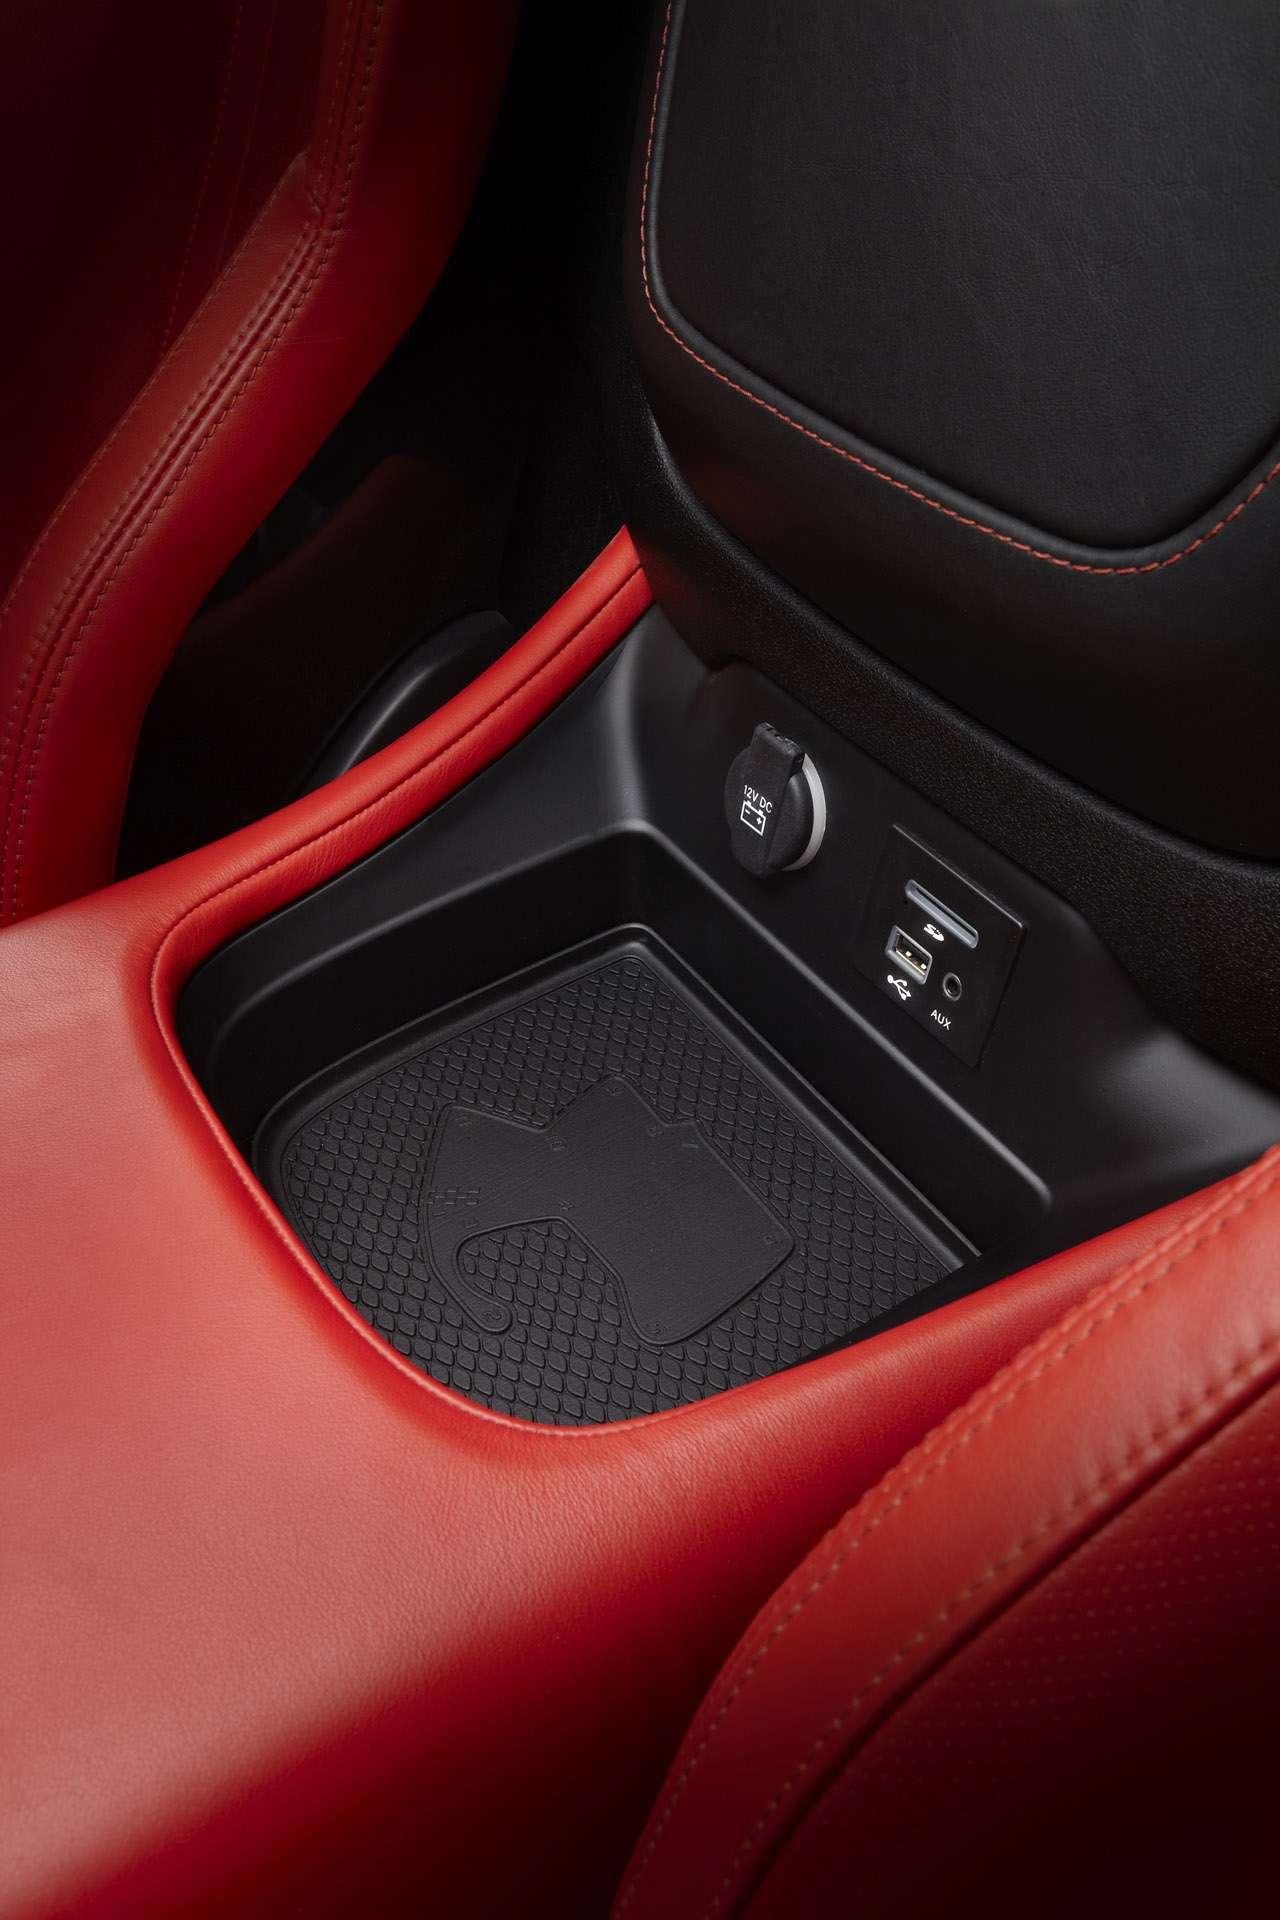 2013 SRT Viper GTS